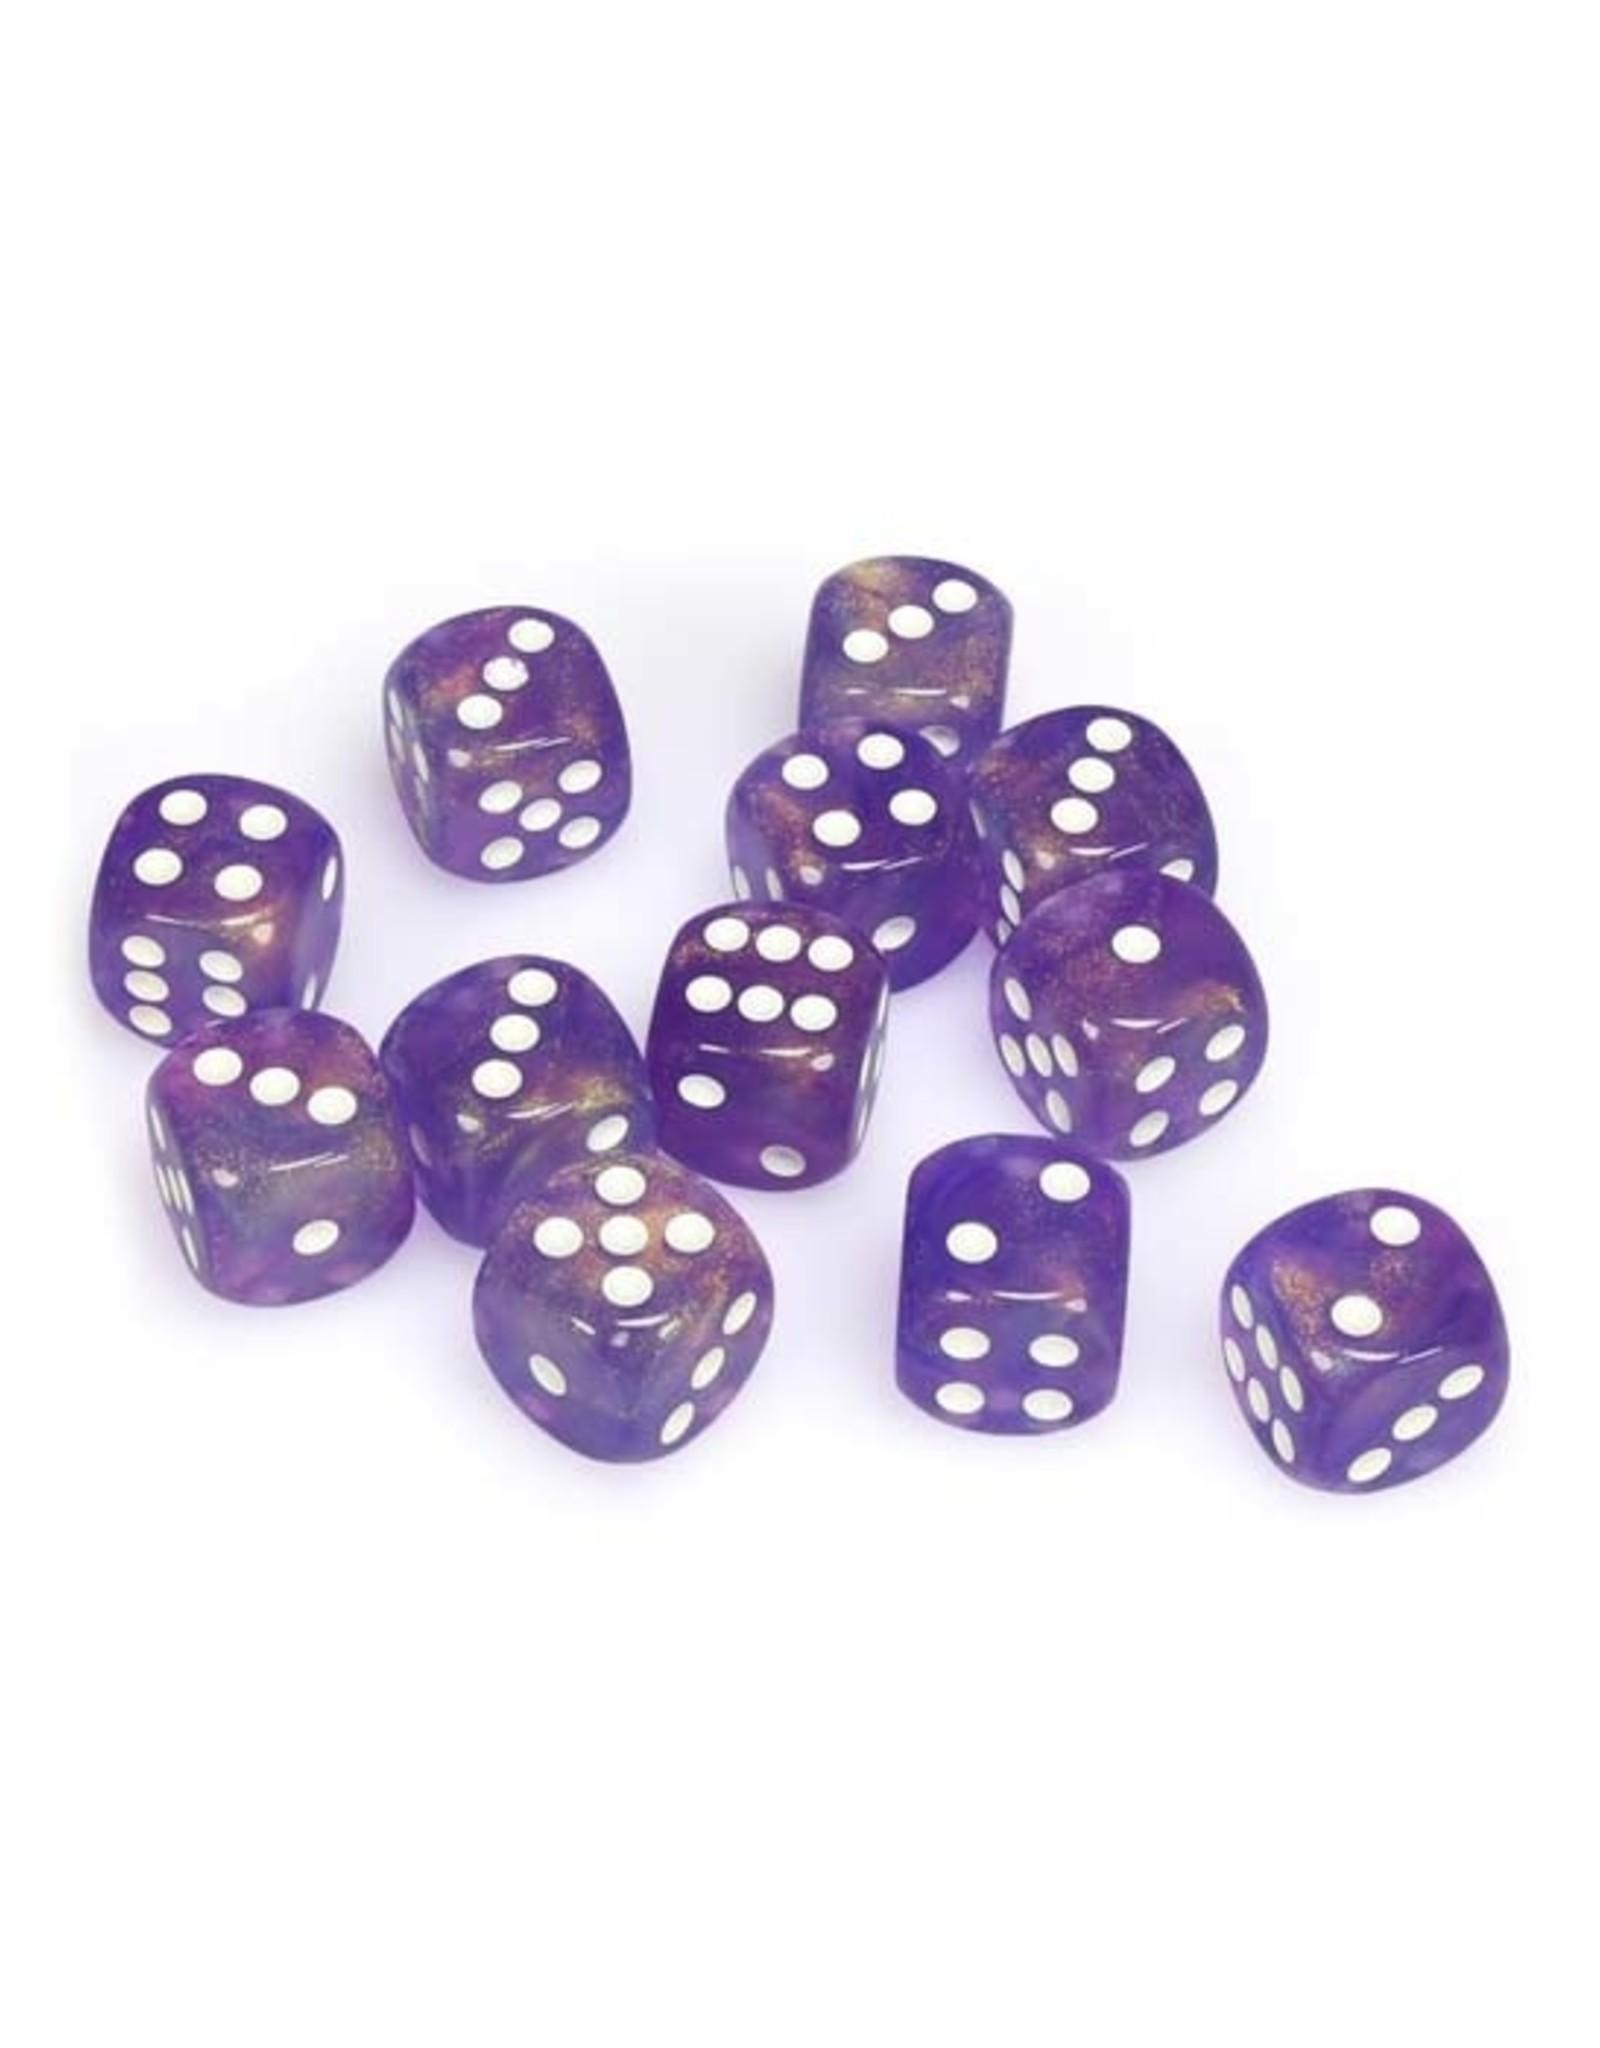 Chessex Chessex: 16mm D6 - Borealis - Purple w/ White